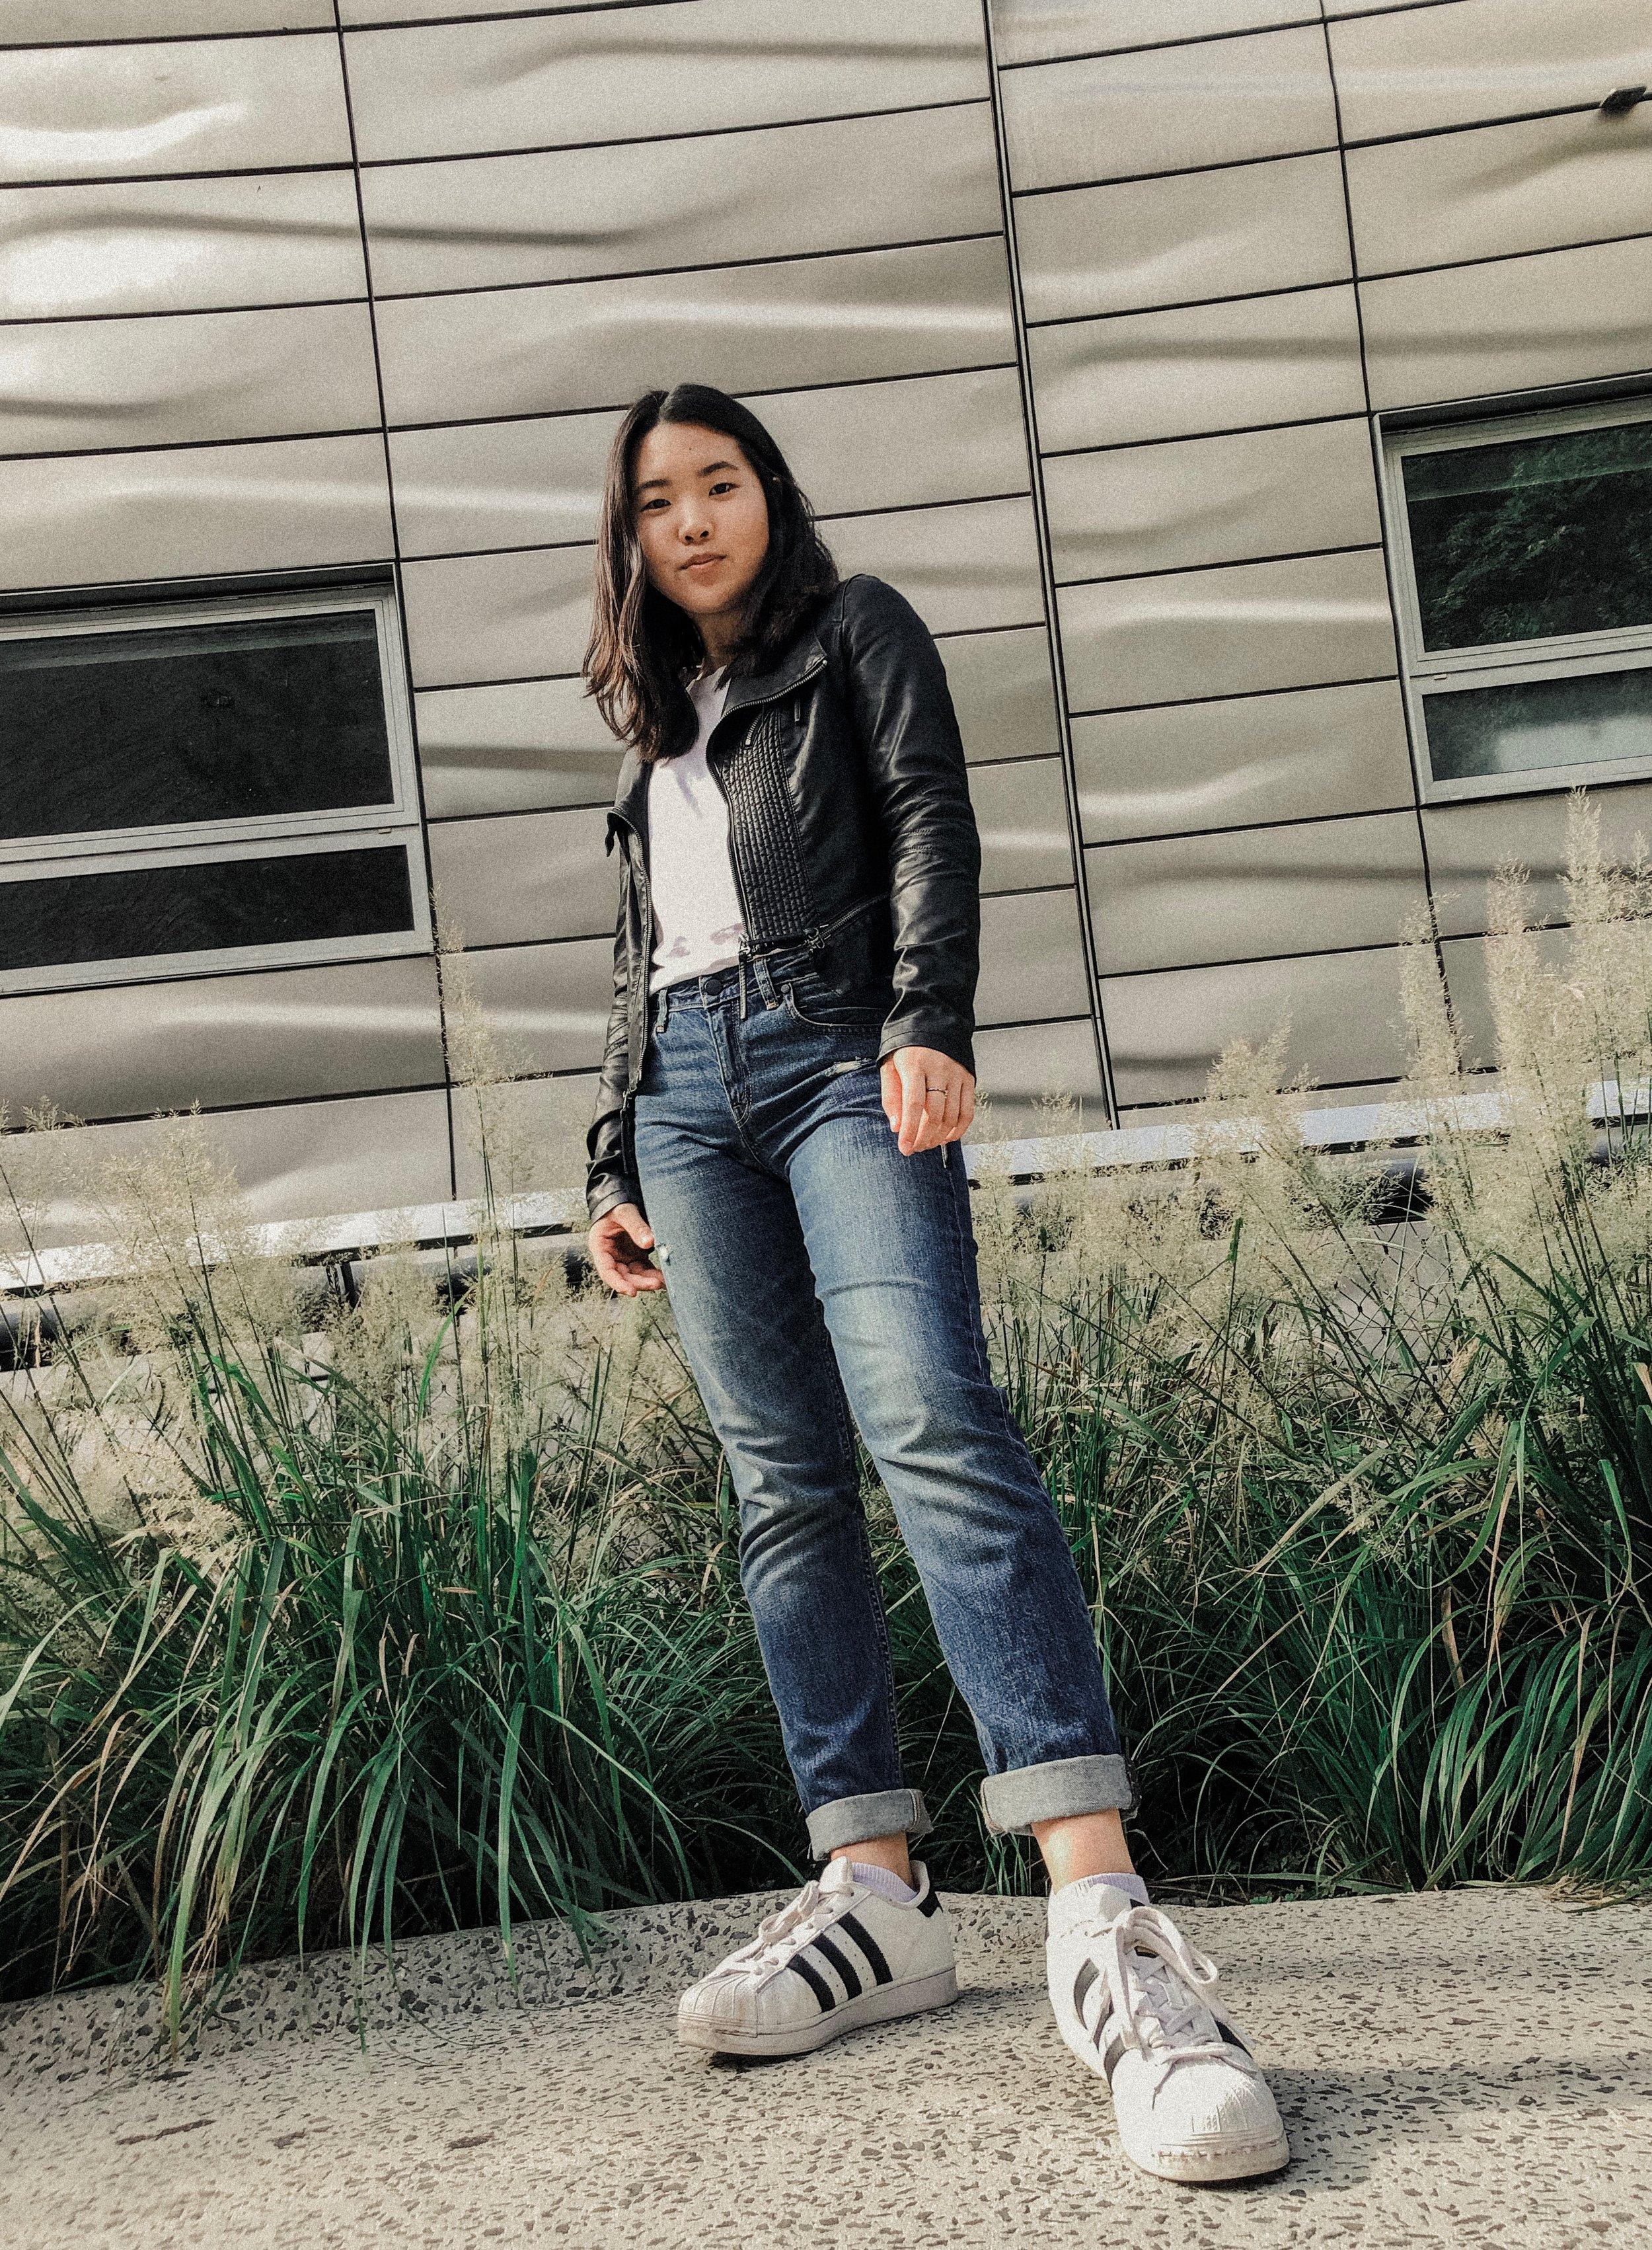 Jacket: Lulu's  Top: J.Crew  Bottom: Zara  Shoes: Adidas